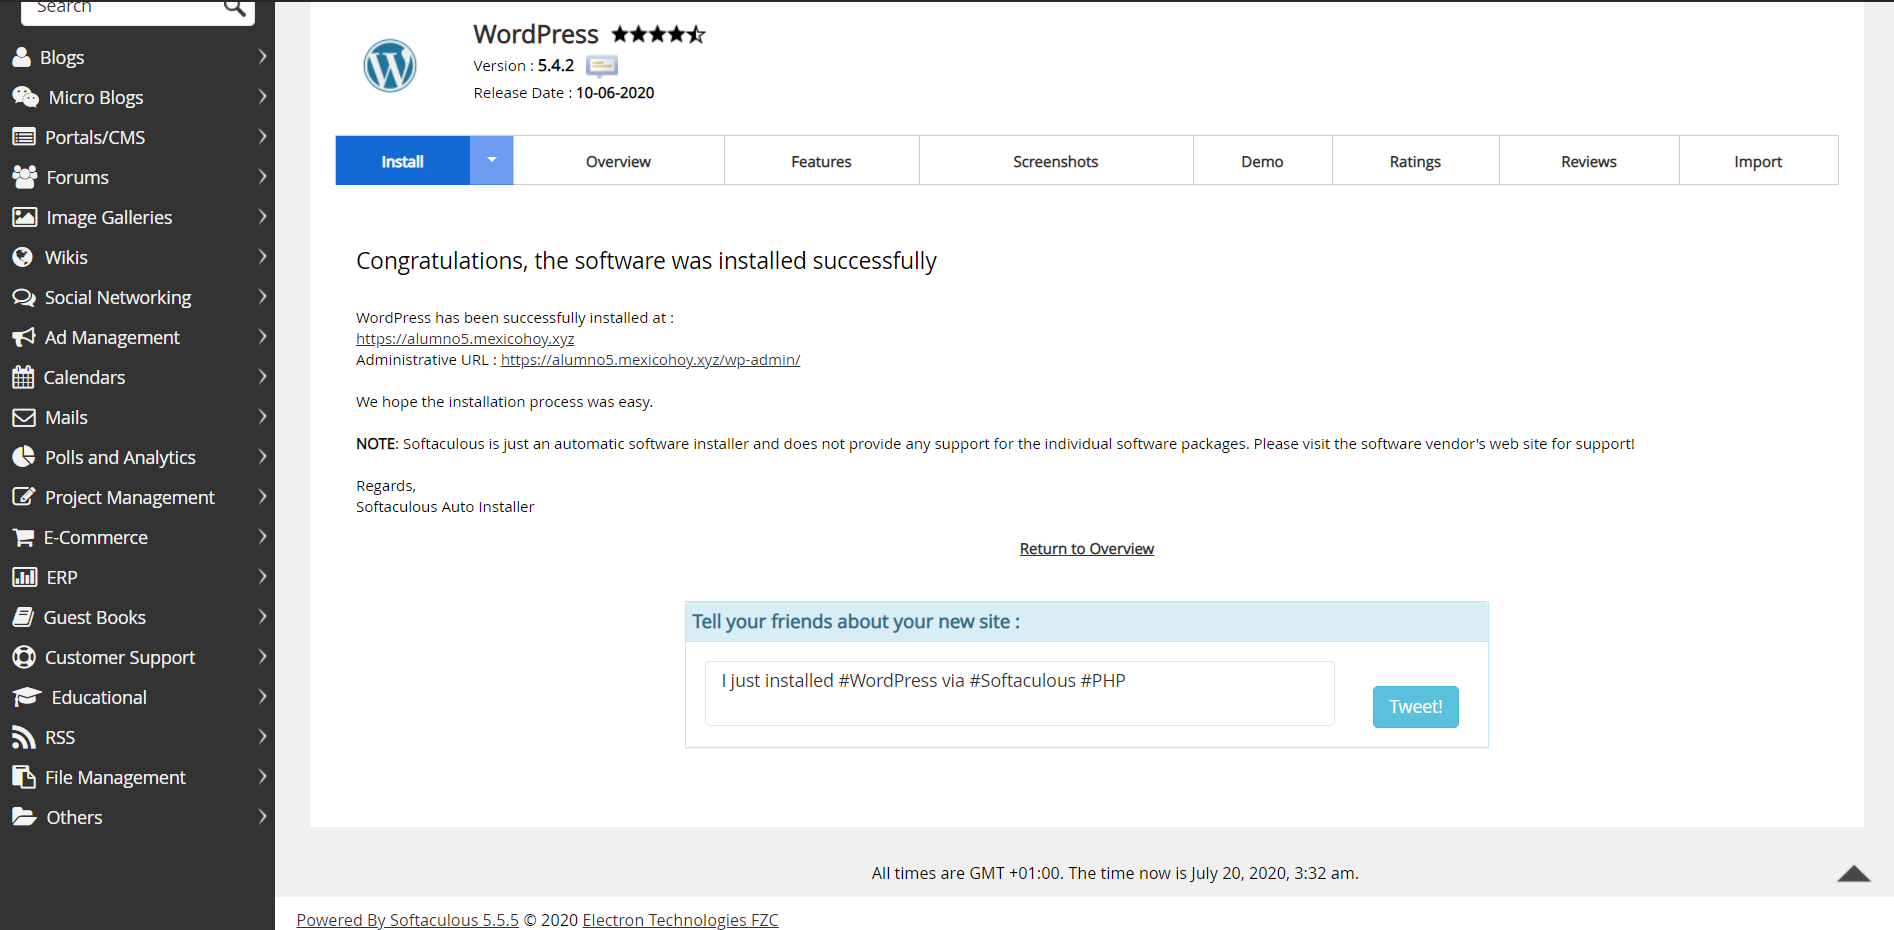 WordPress Instalado Exitosamente.